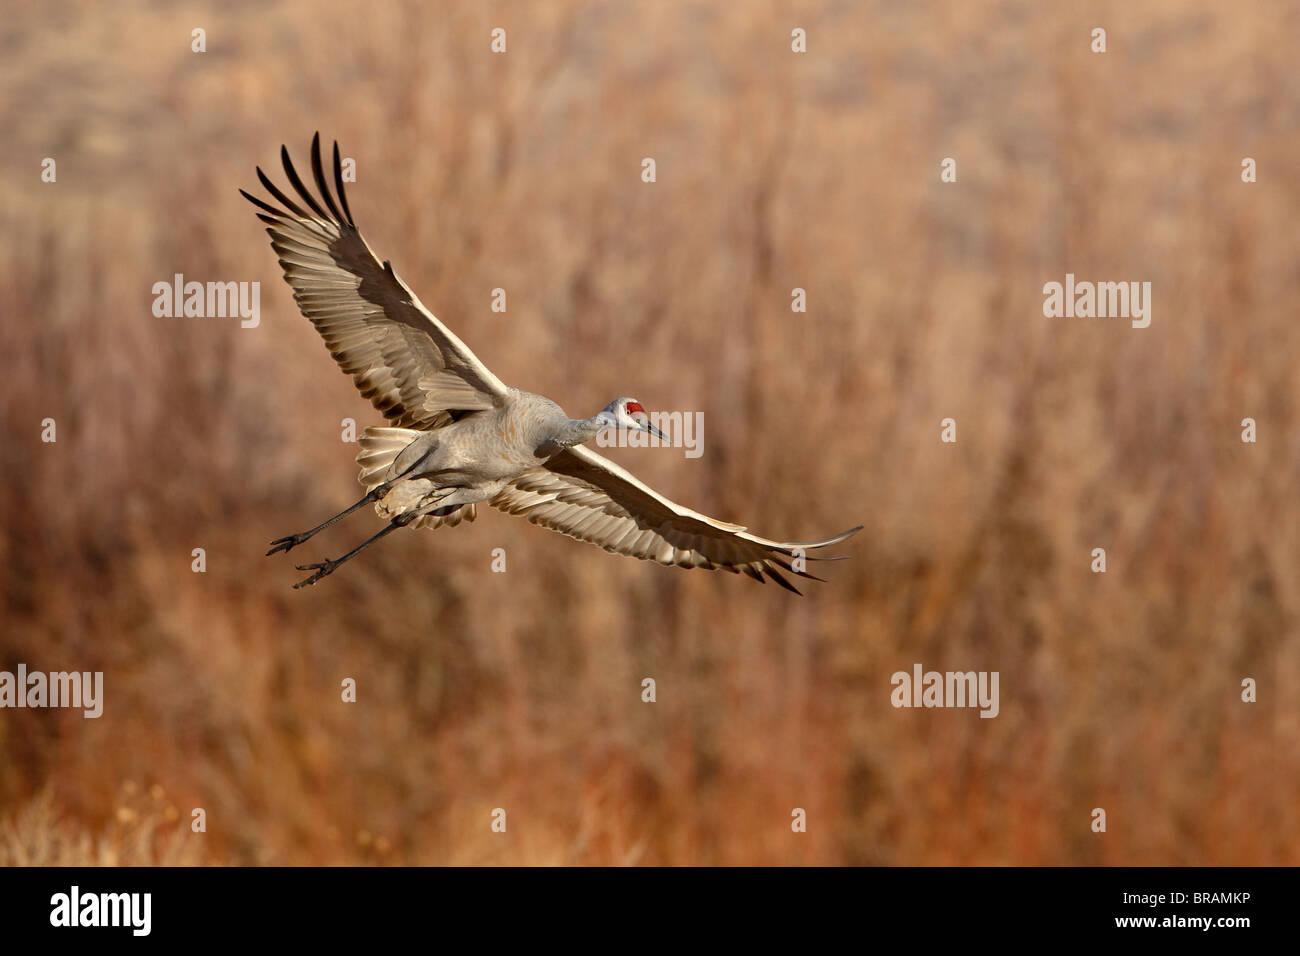 Sandhill Crane (Grus canadensis) just about to land, Bernardo Wildlife Area, Ladd S. Gordon Wildlife Complex, New - Stock Image